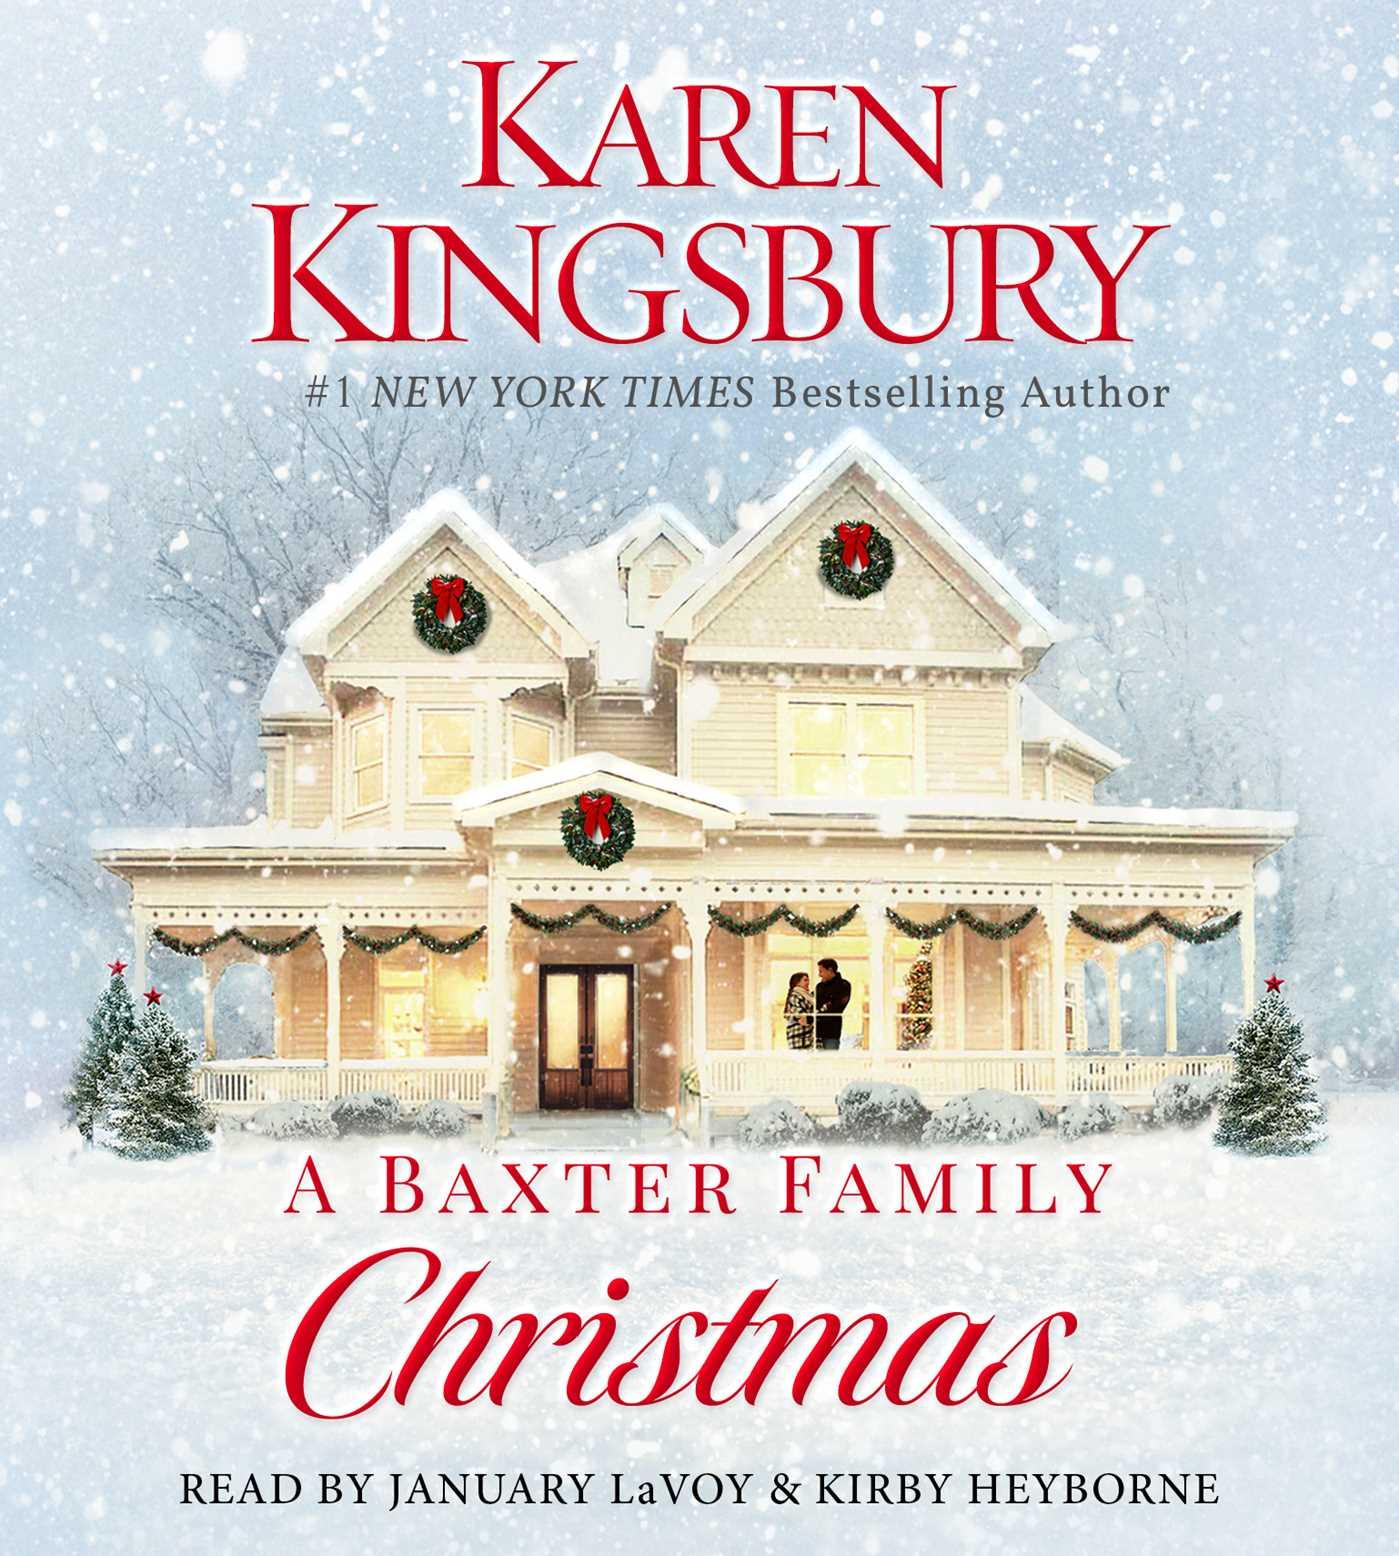 A Baxter Family Christmas Audiobook on CD by Karen Kingsbury ...